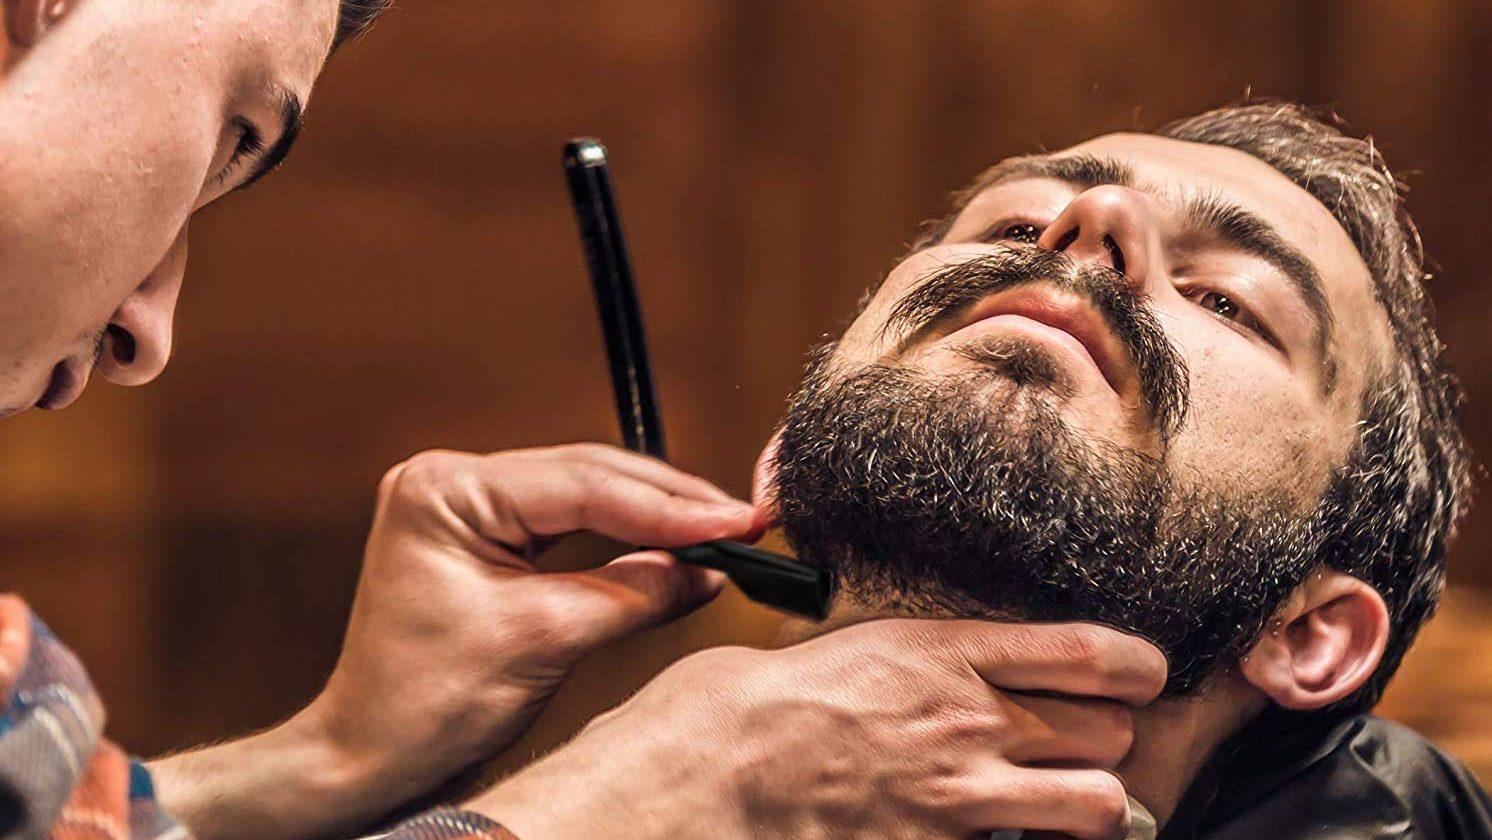 The easiest straight razor to handle